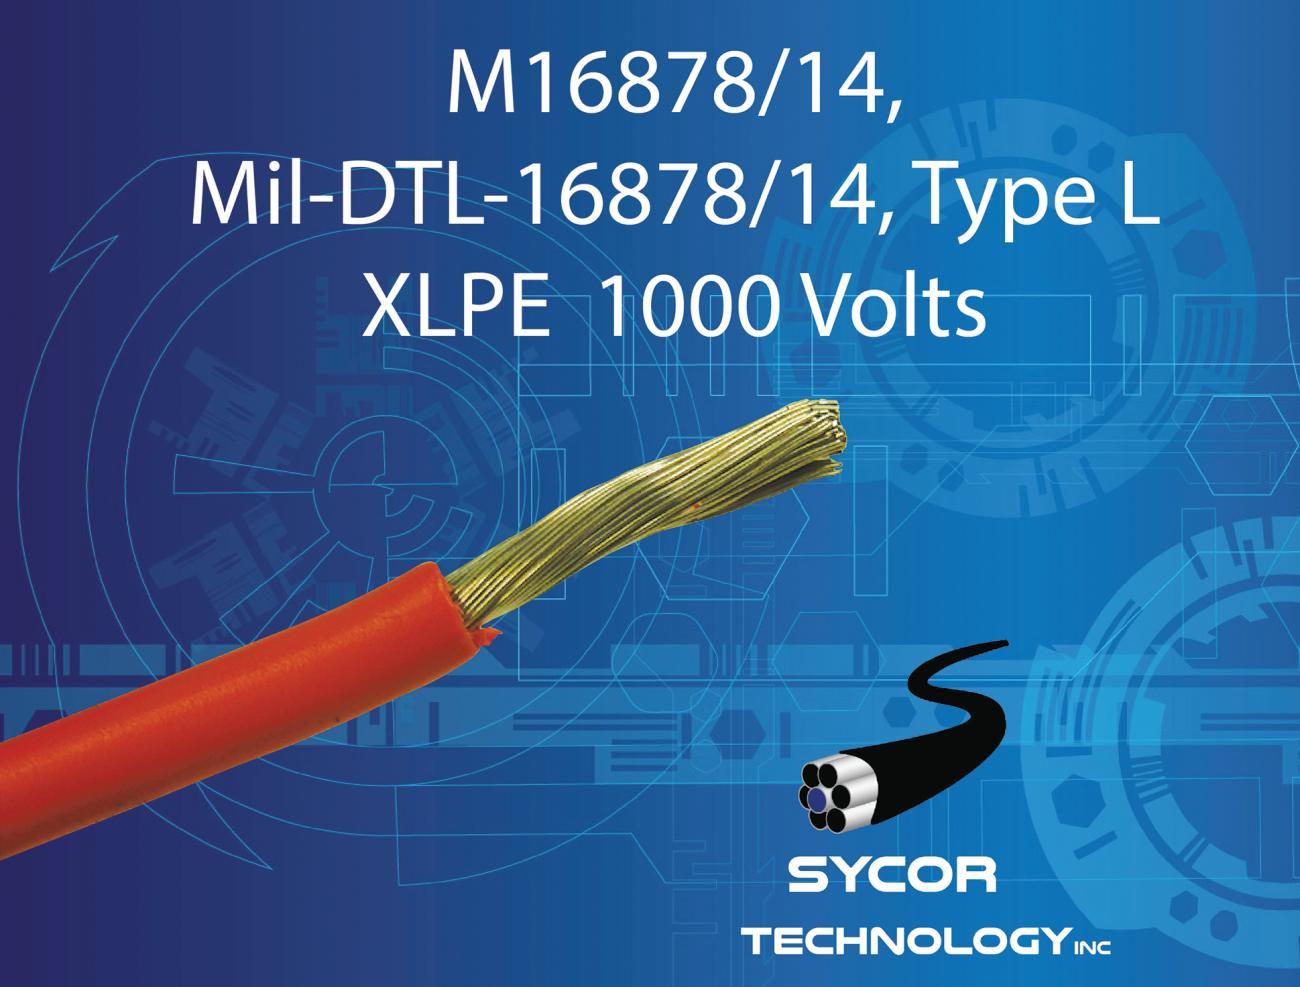 M16878/14, Mil-DTL-16878/14 Type L wire